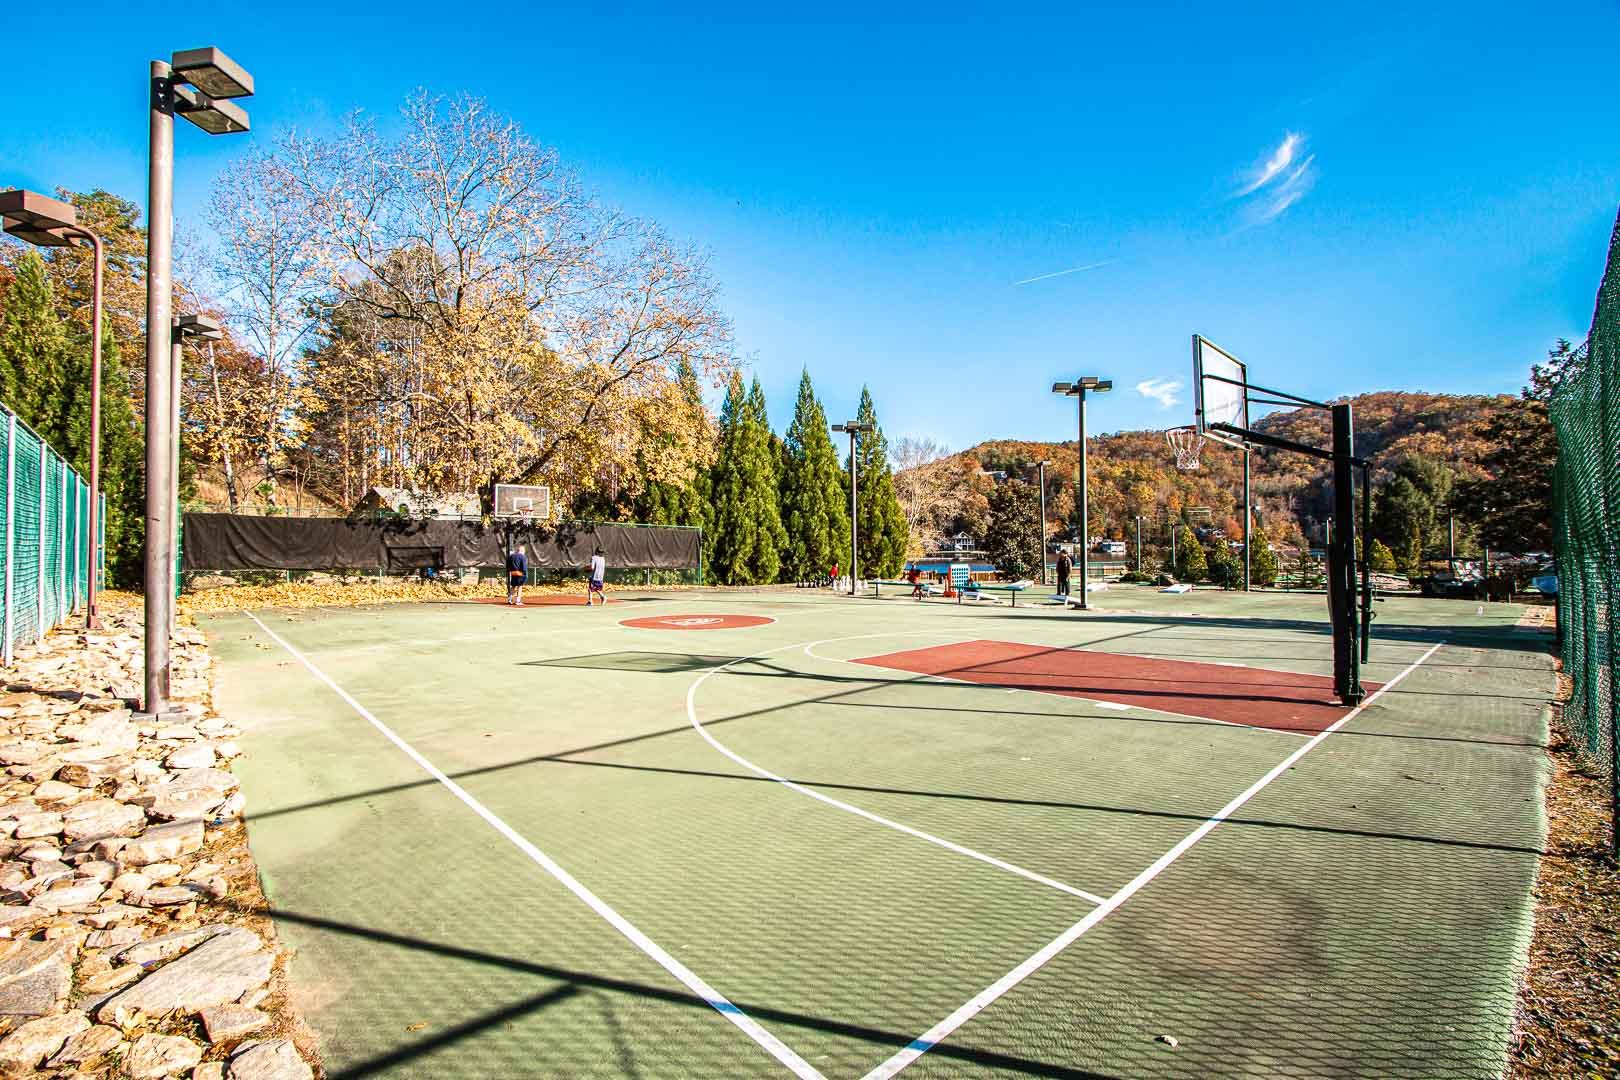 Outdoor basketball courts at VRI's Fox Run Resort in North Carolina.